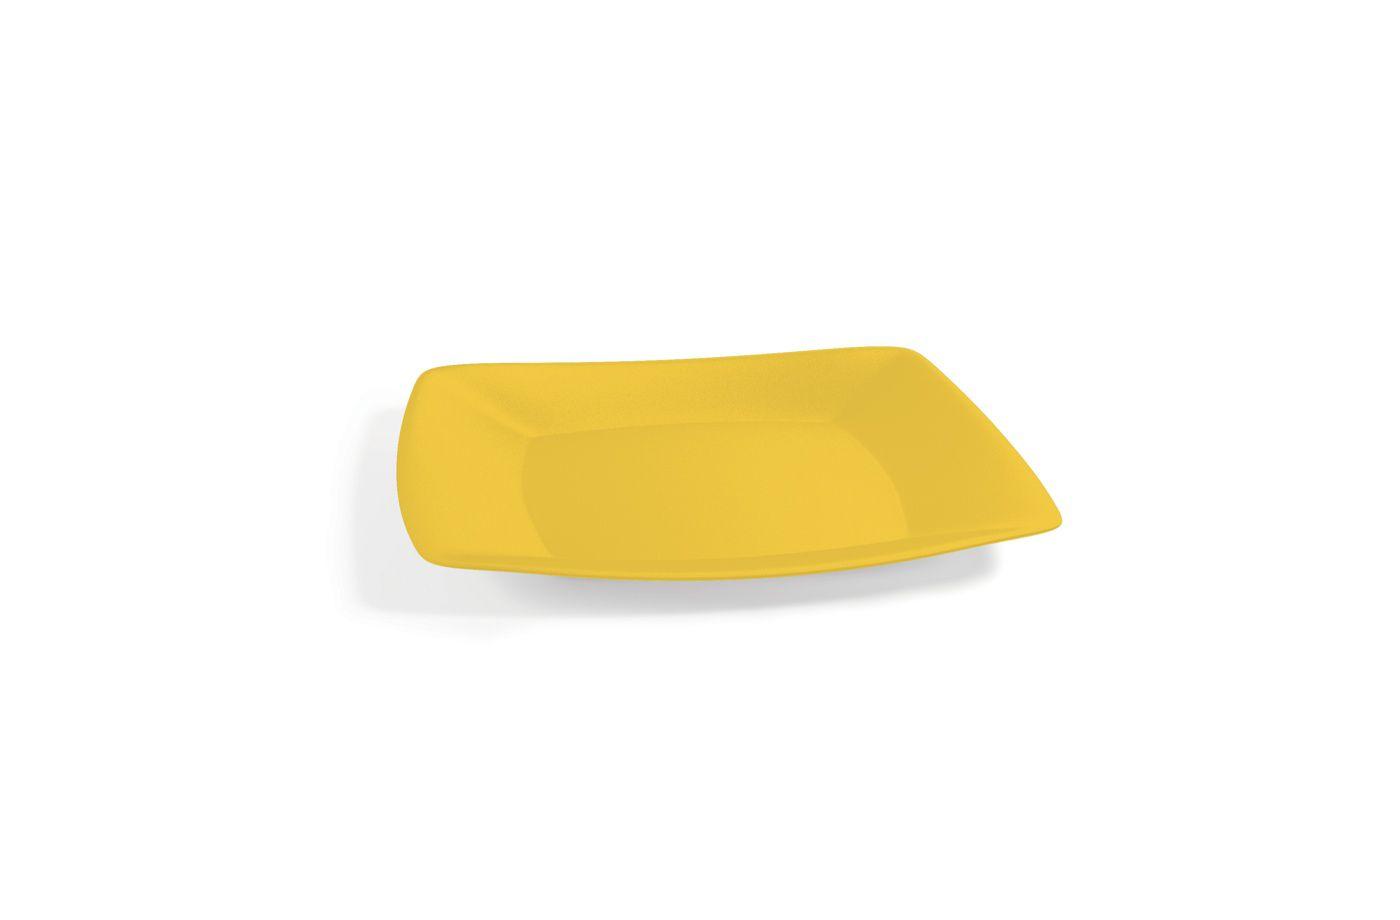 Prato Lanche Plástico Quadrado P 18,5 cm Amarelo